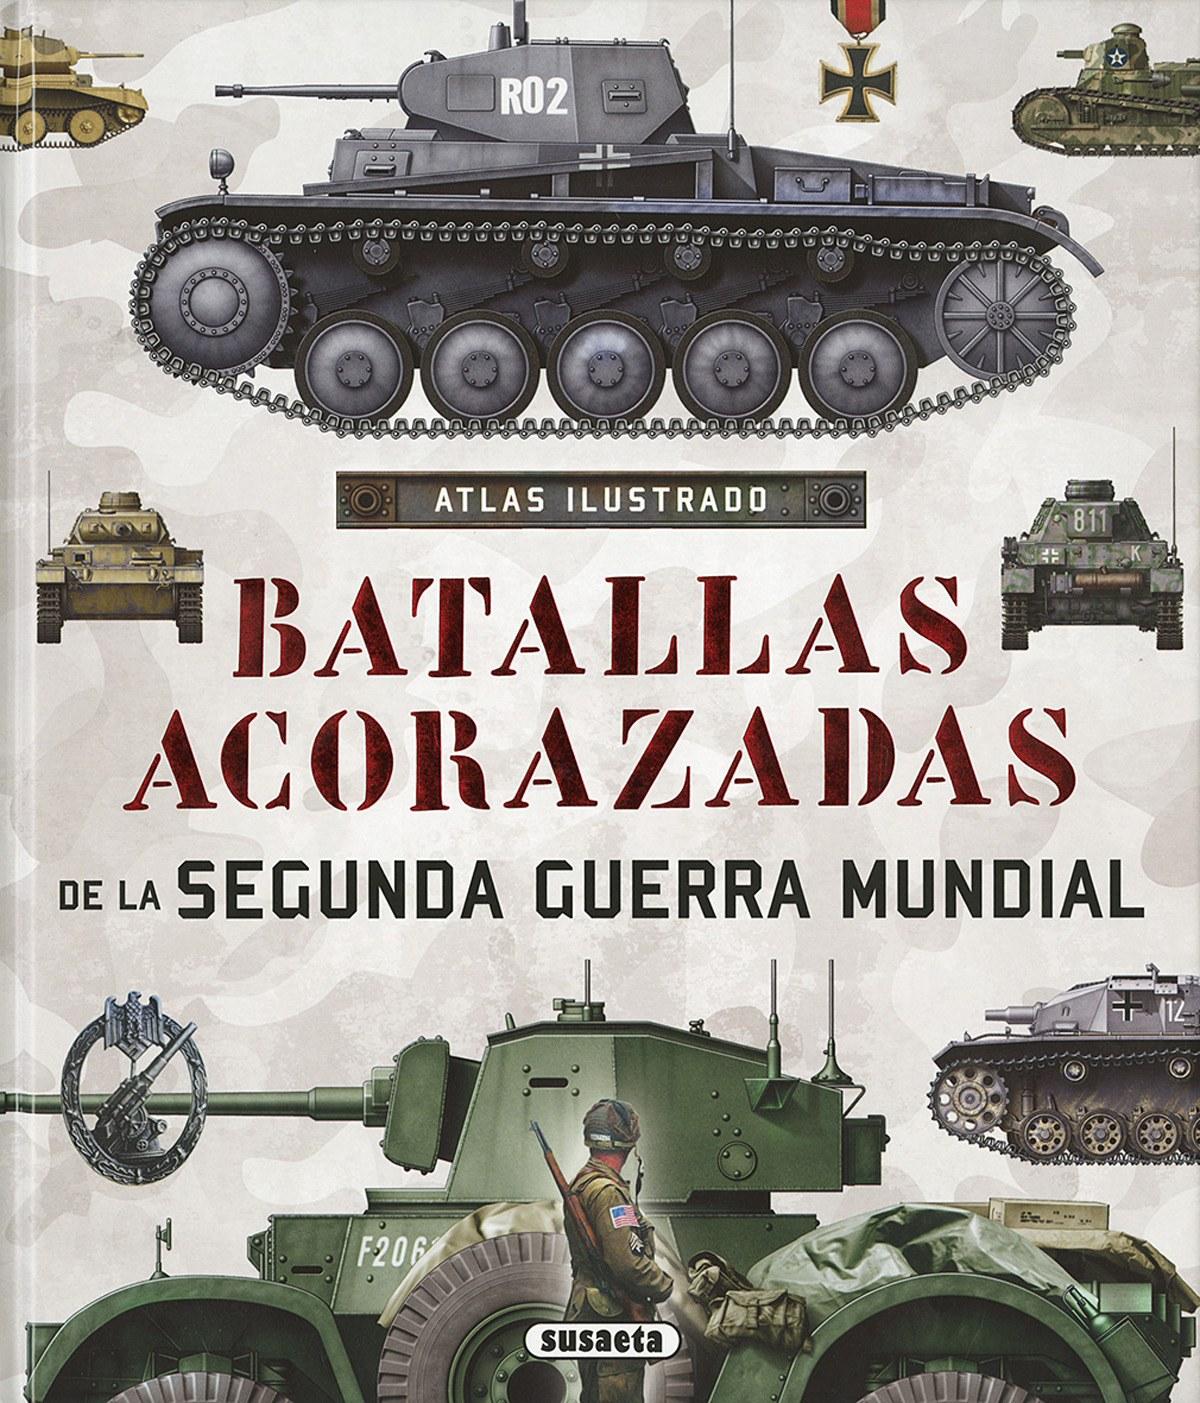 Batallas acorazadas segunda guerra mundial 9788467748352